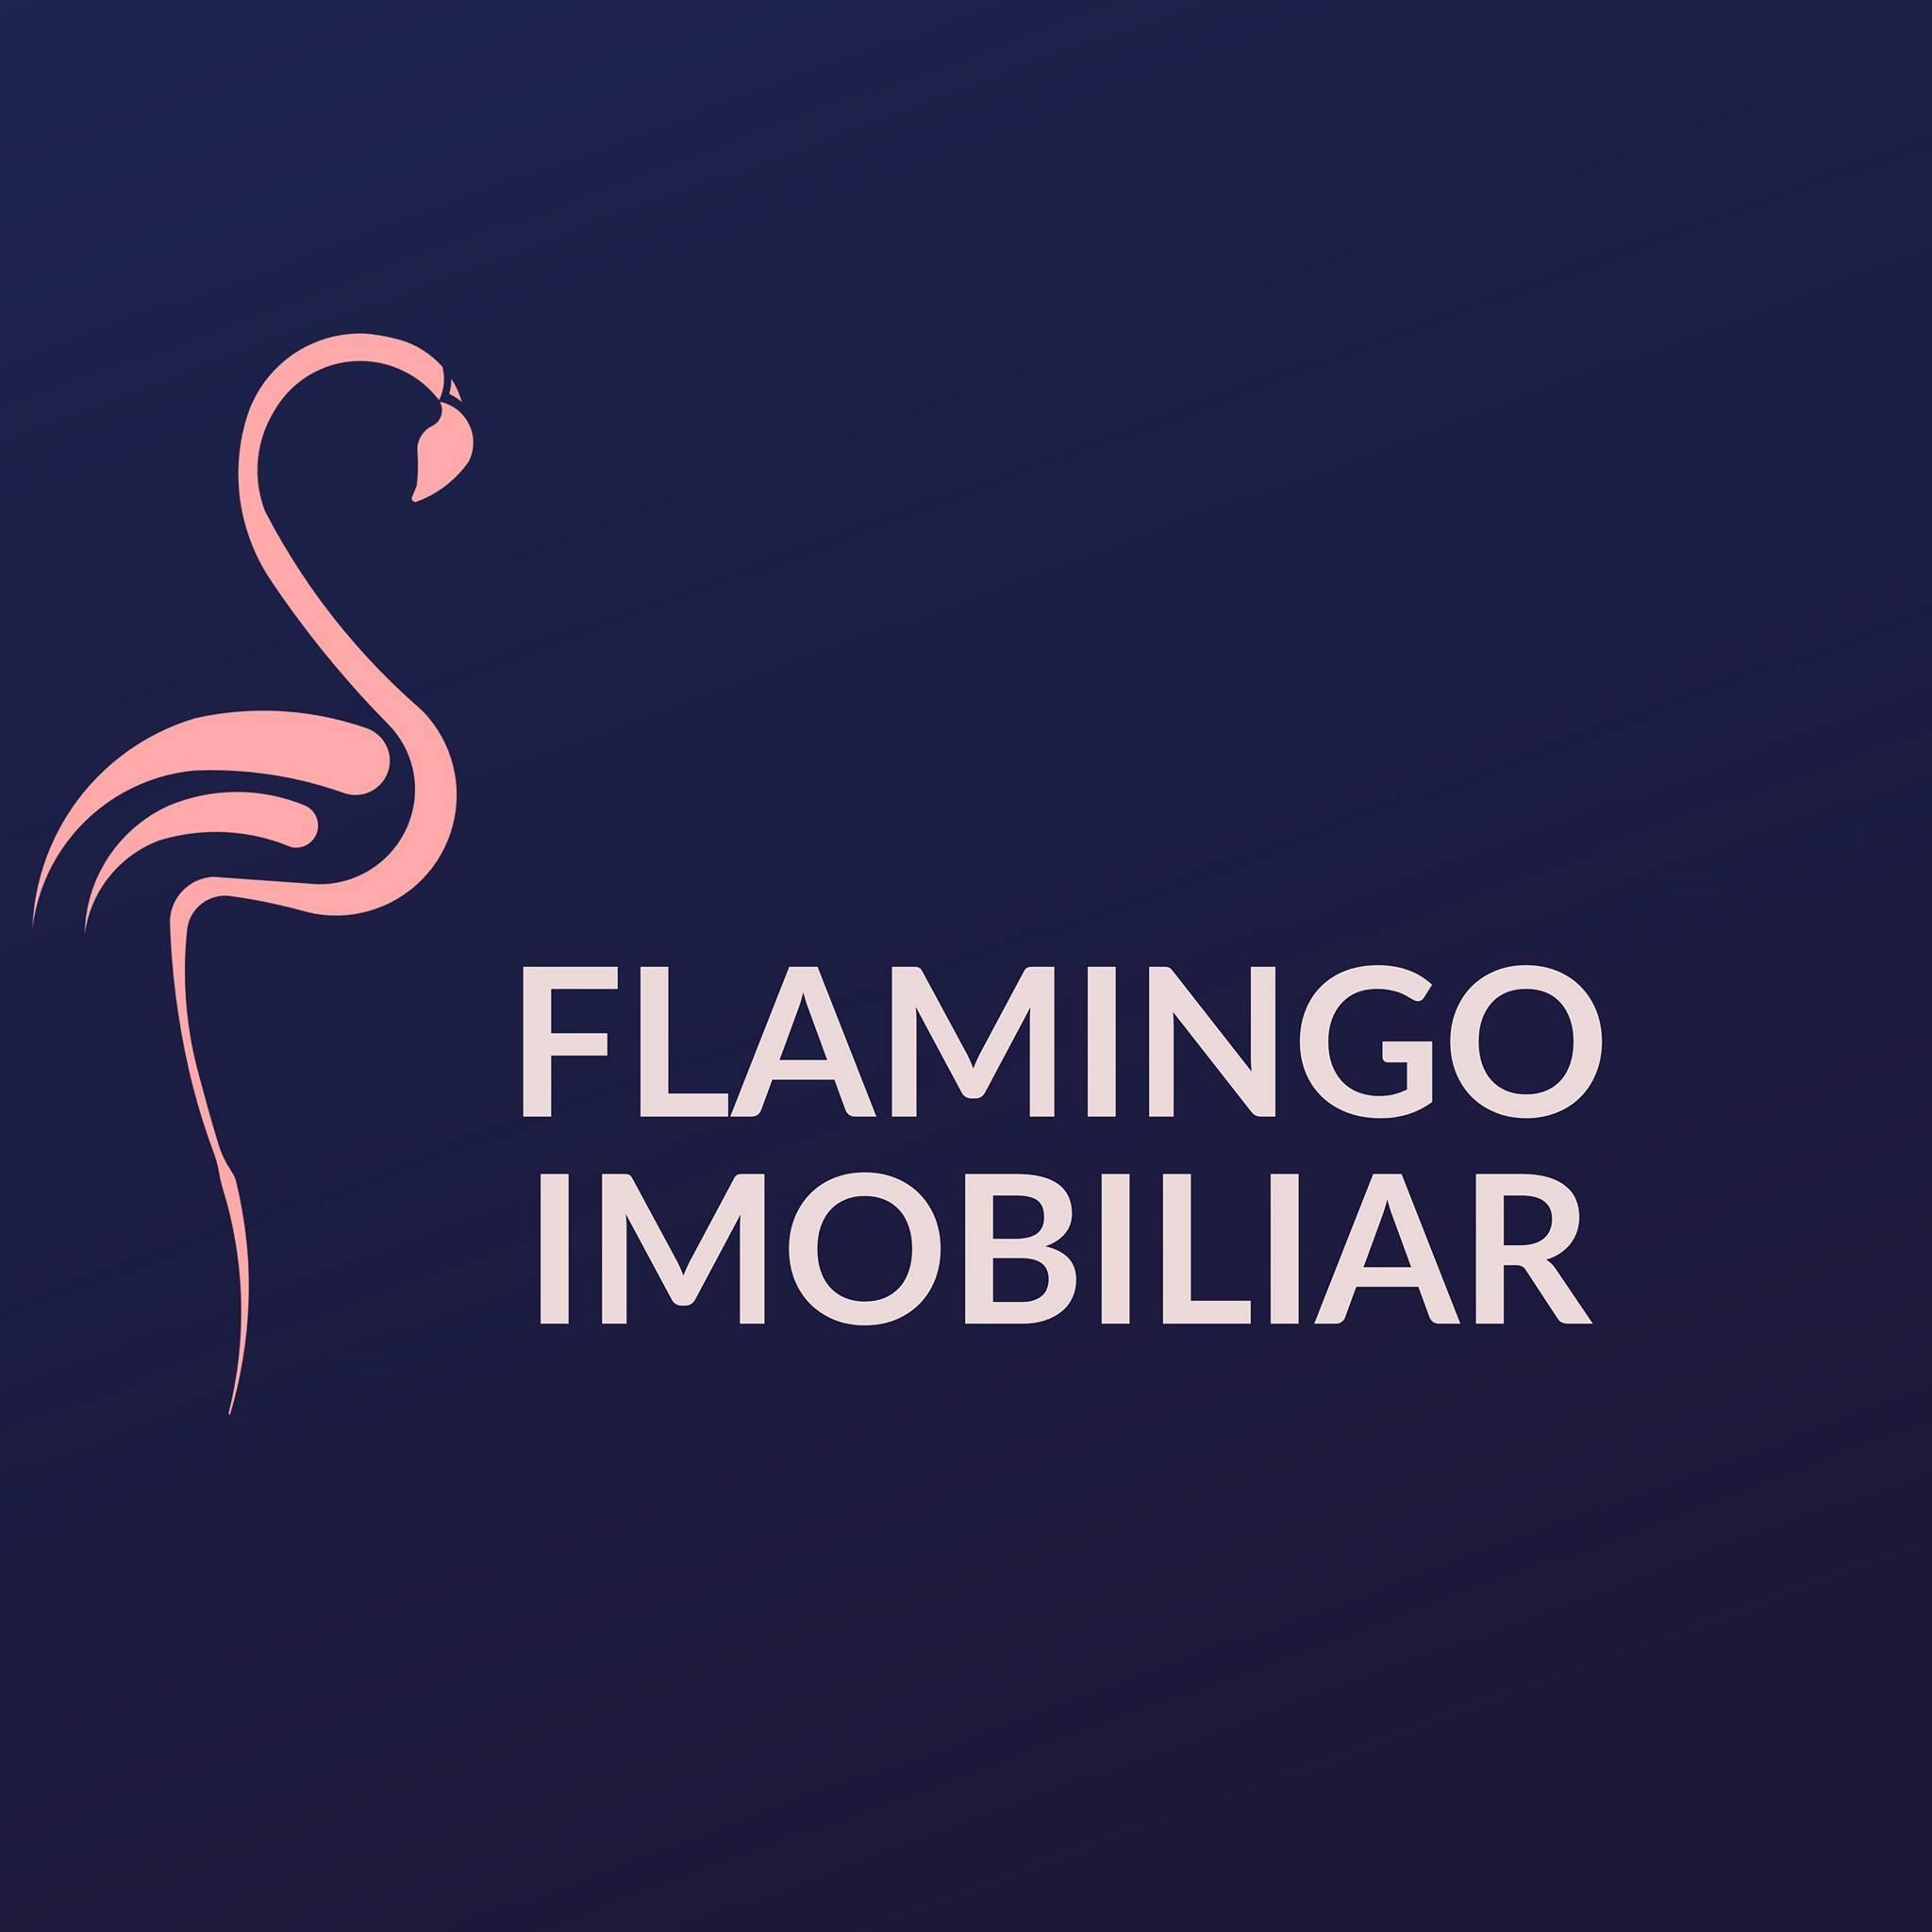 Flamingo Imobiliar